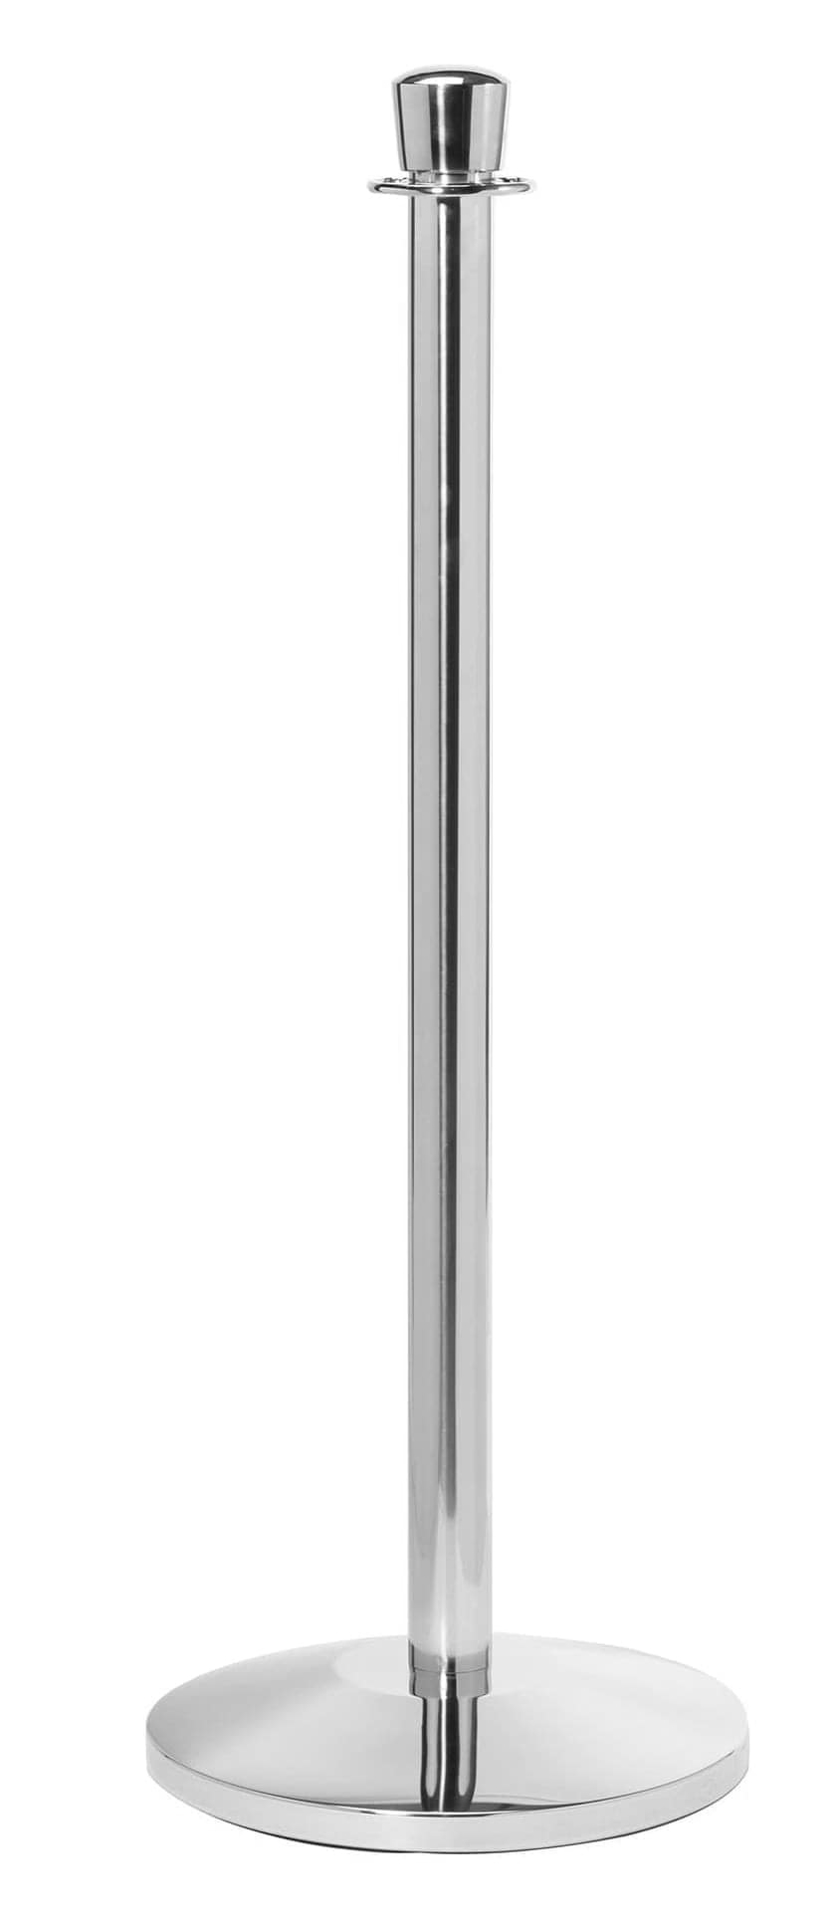 Chromed Steel Urn Top Stanchion